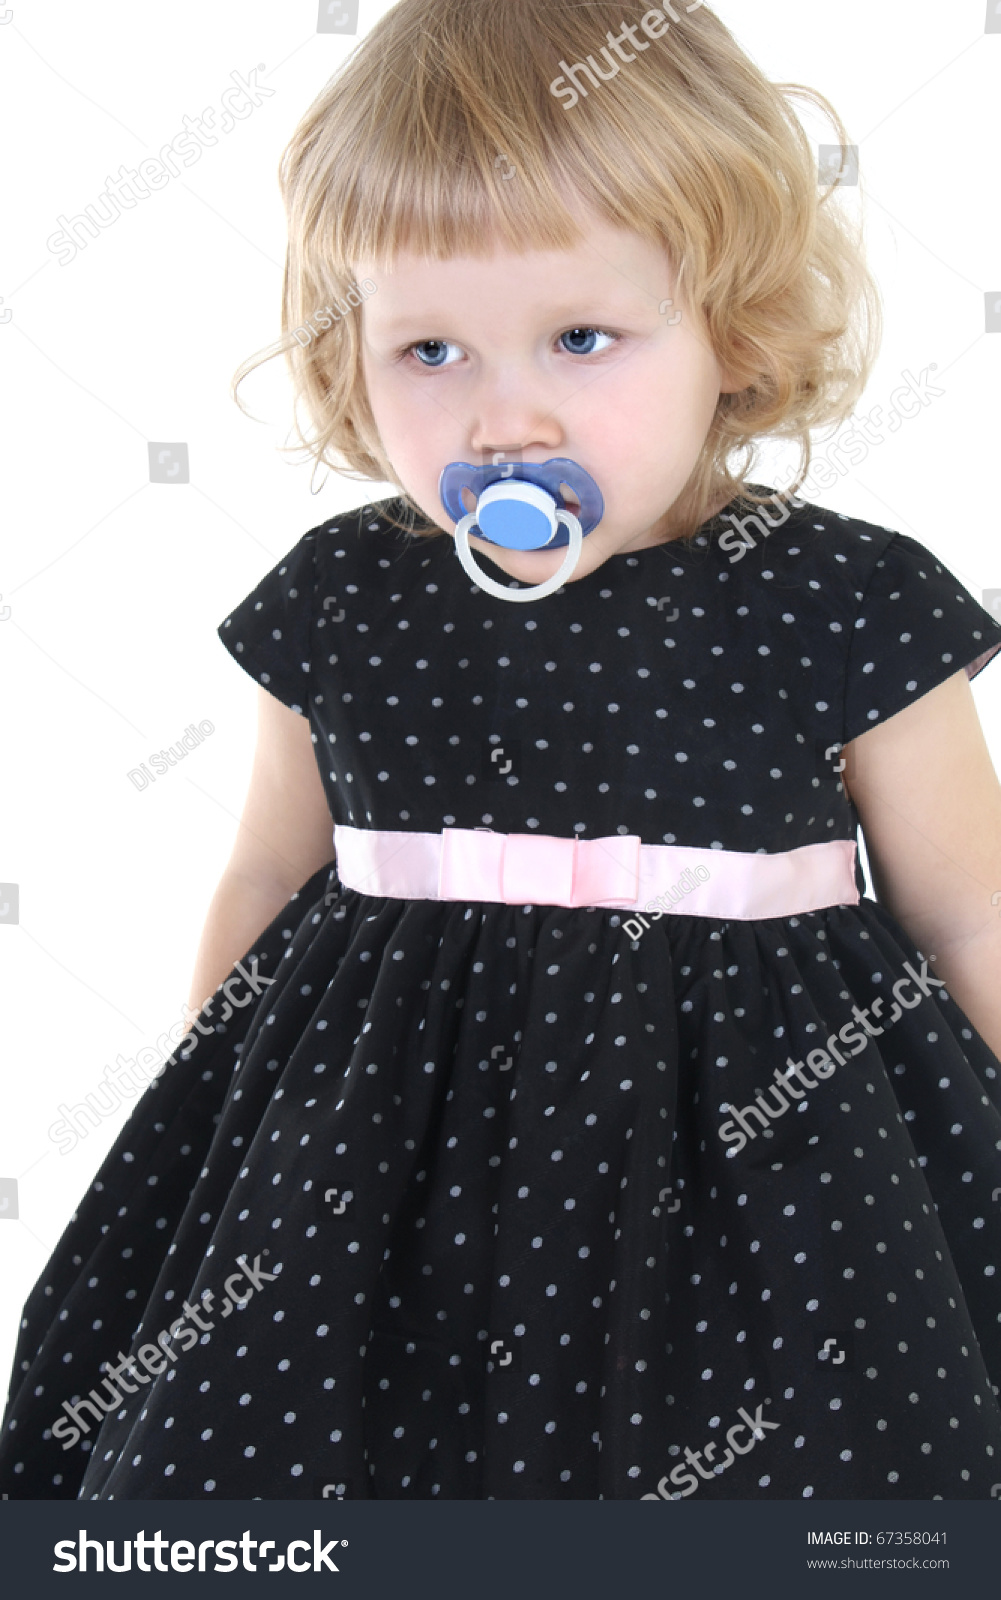 Little girl nipple